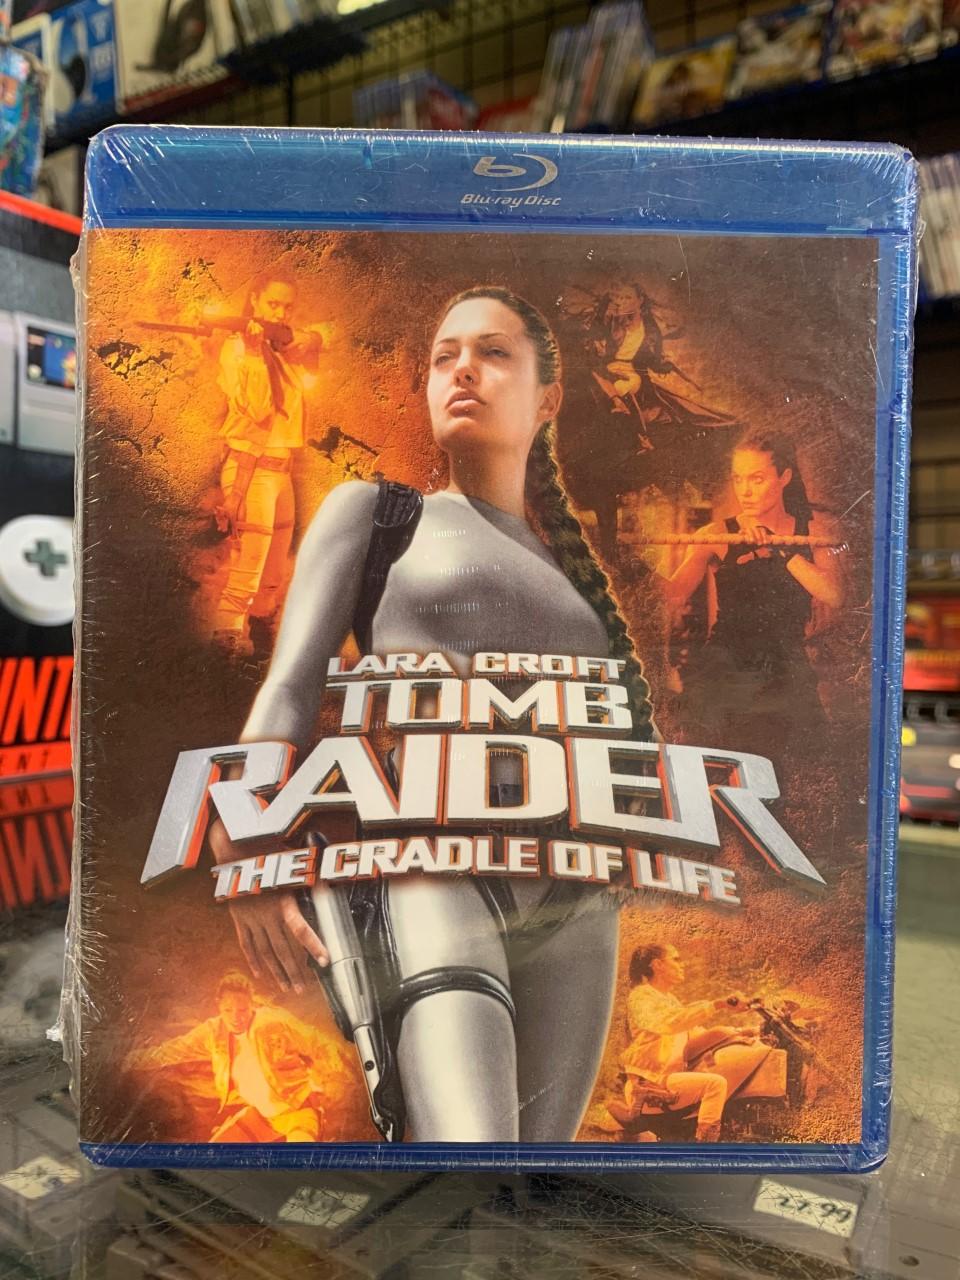 Lara Croft Tomb Raider The Cradle Of Life Blu Ray Movie Galore